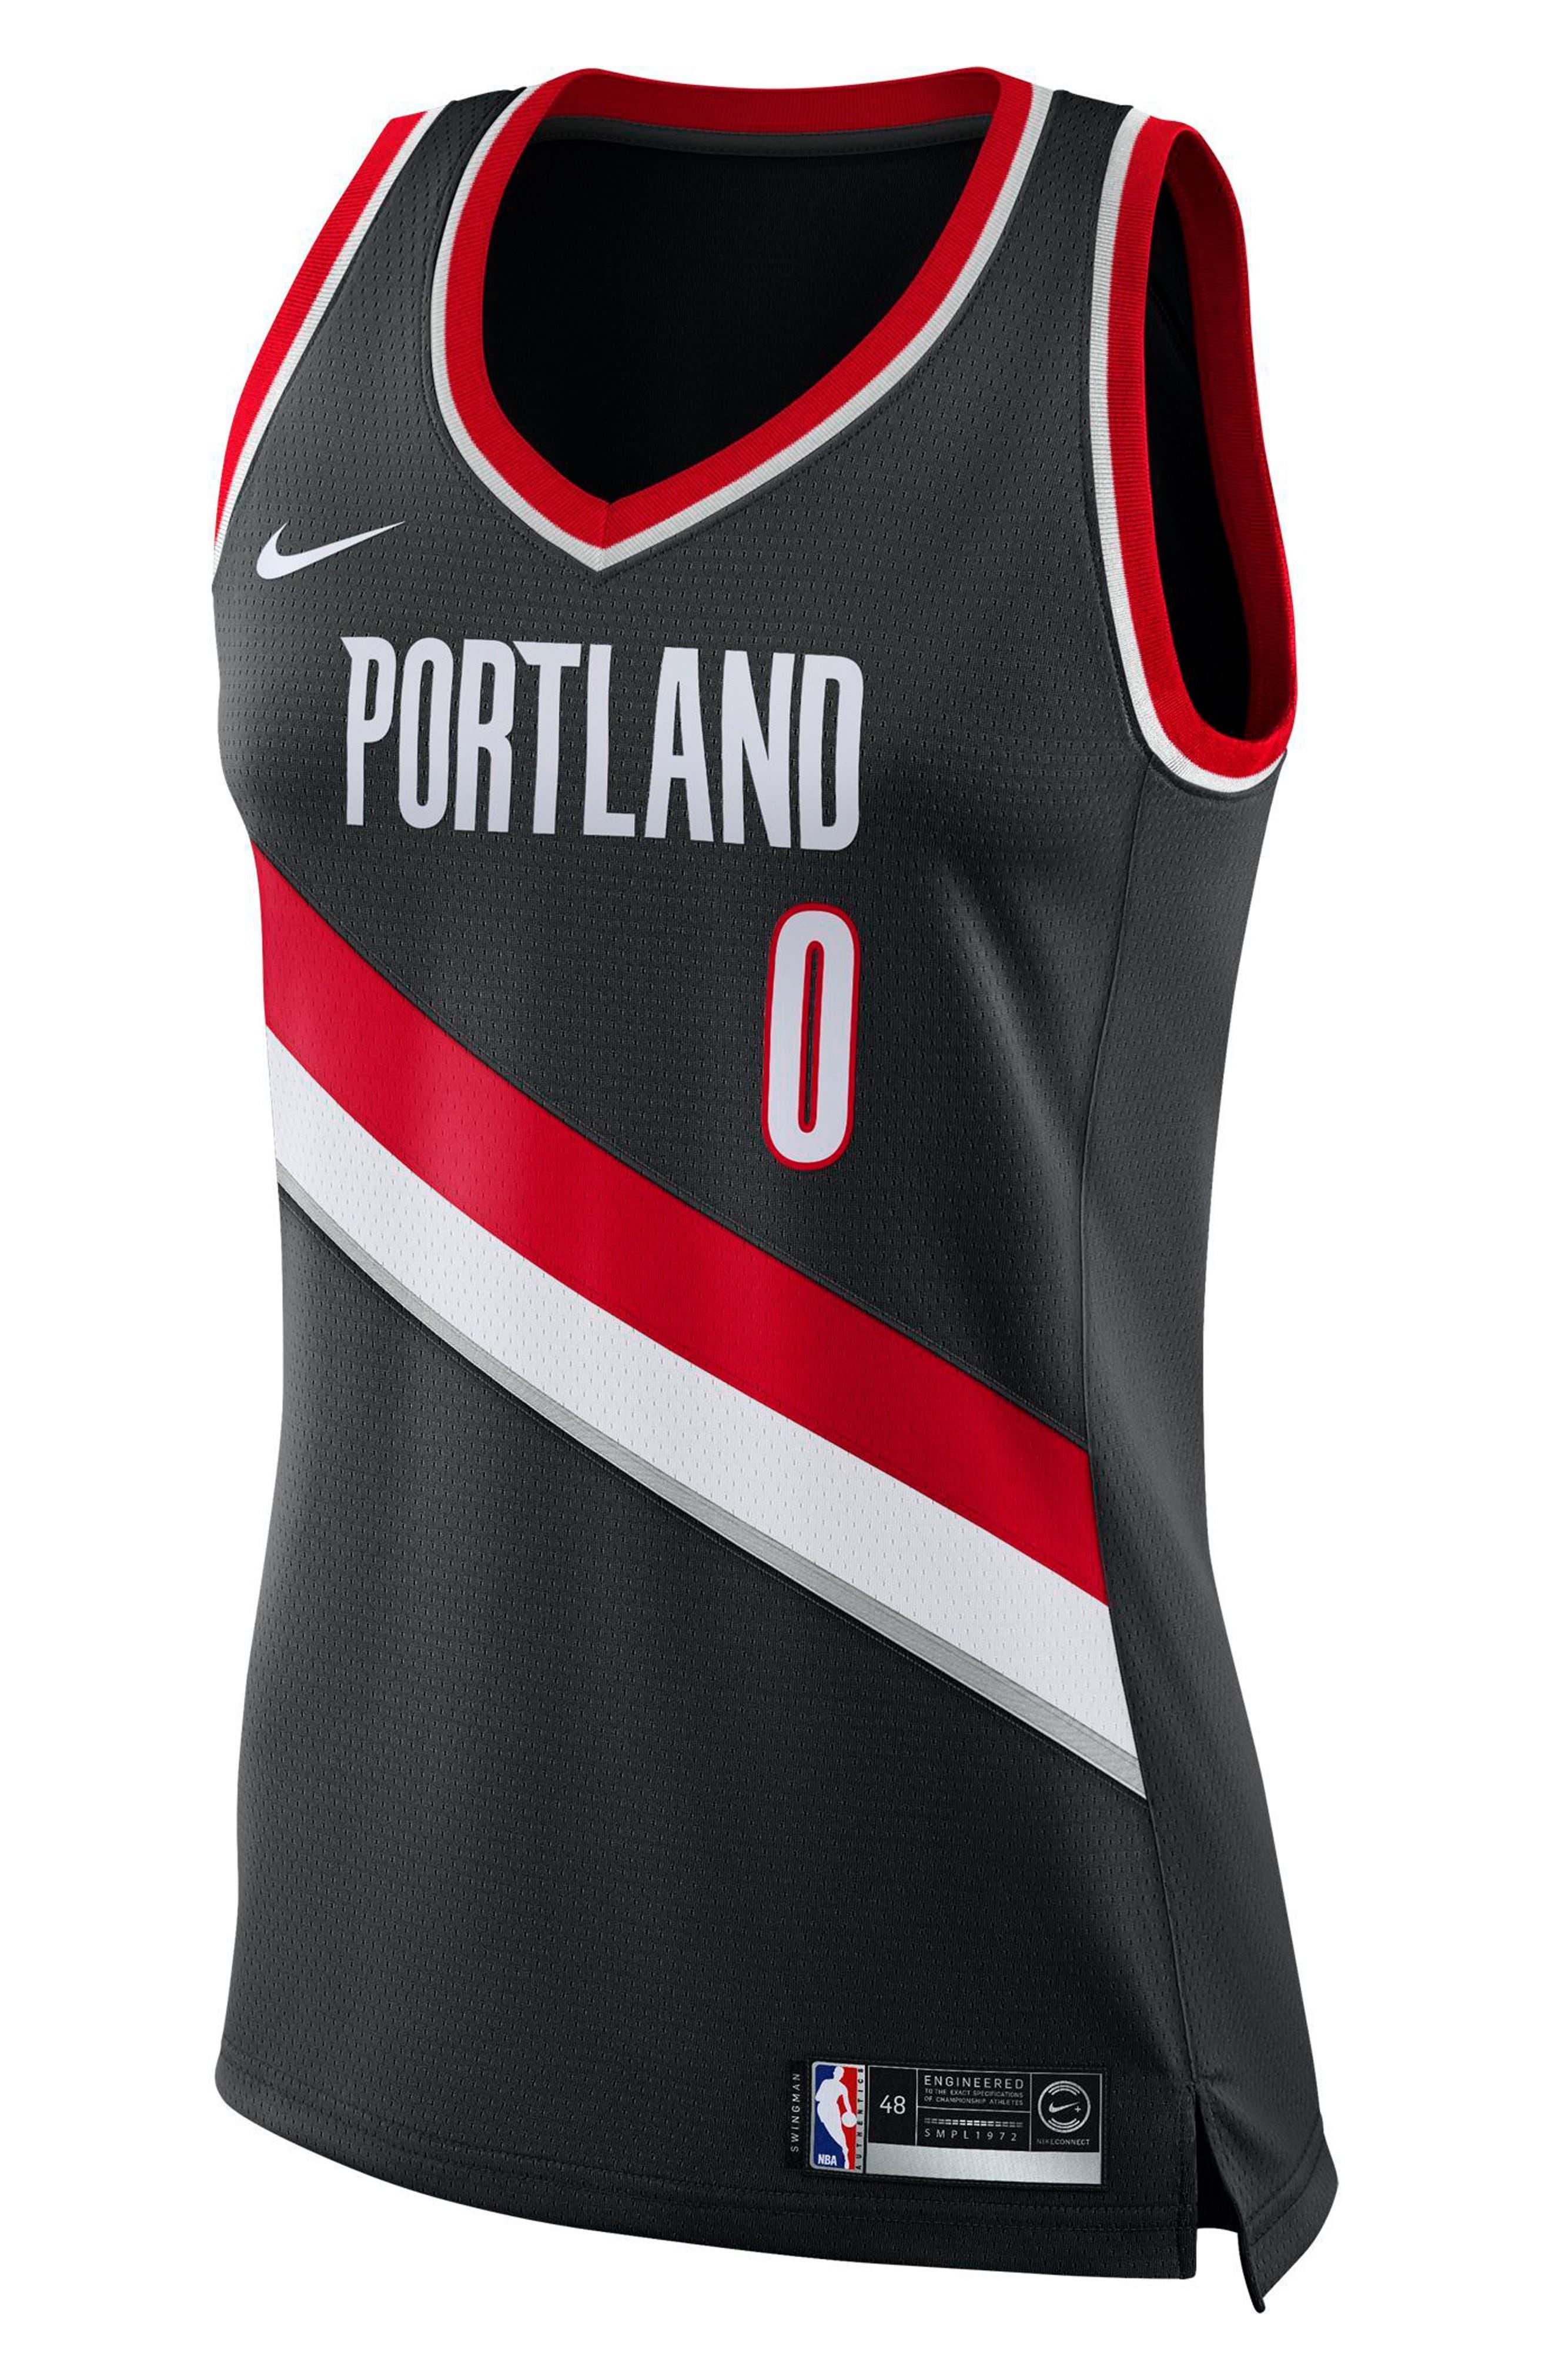 Main Image - Nike Portland Trail Blazers Icon Edition Swingman Women's NBA Jersey